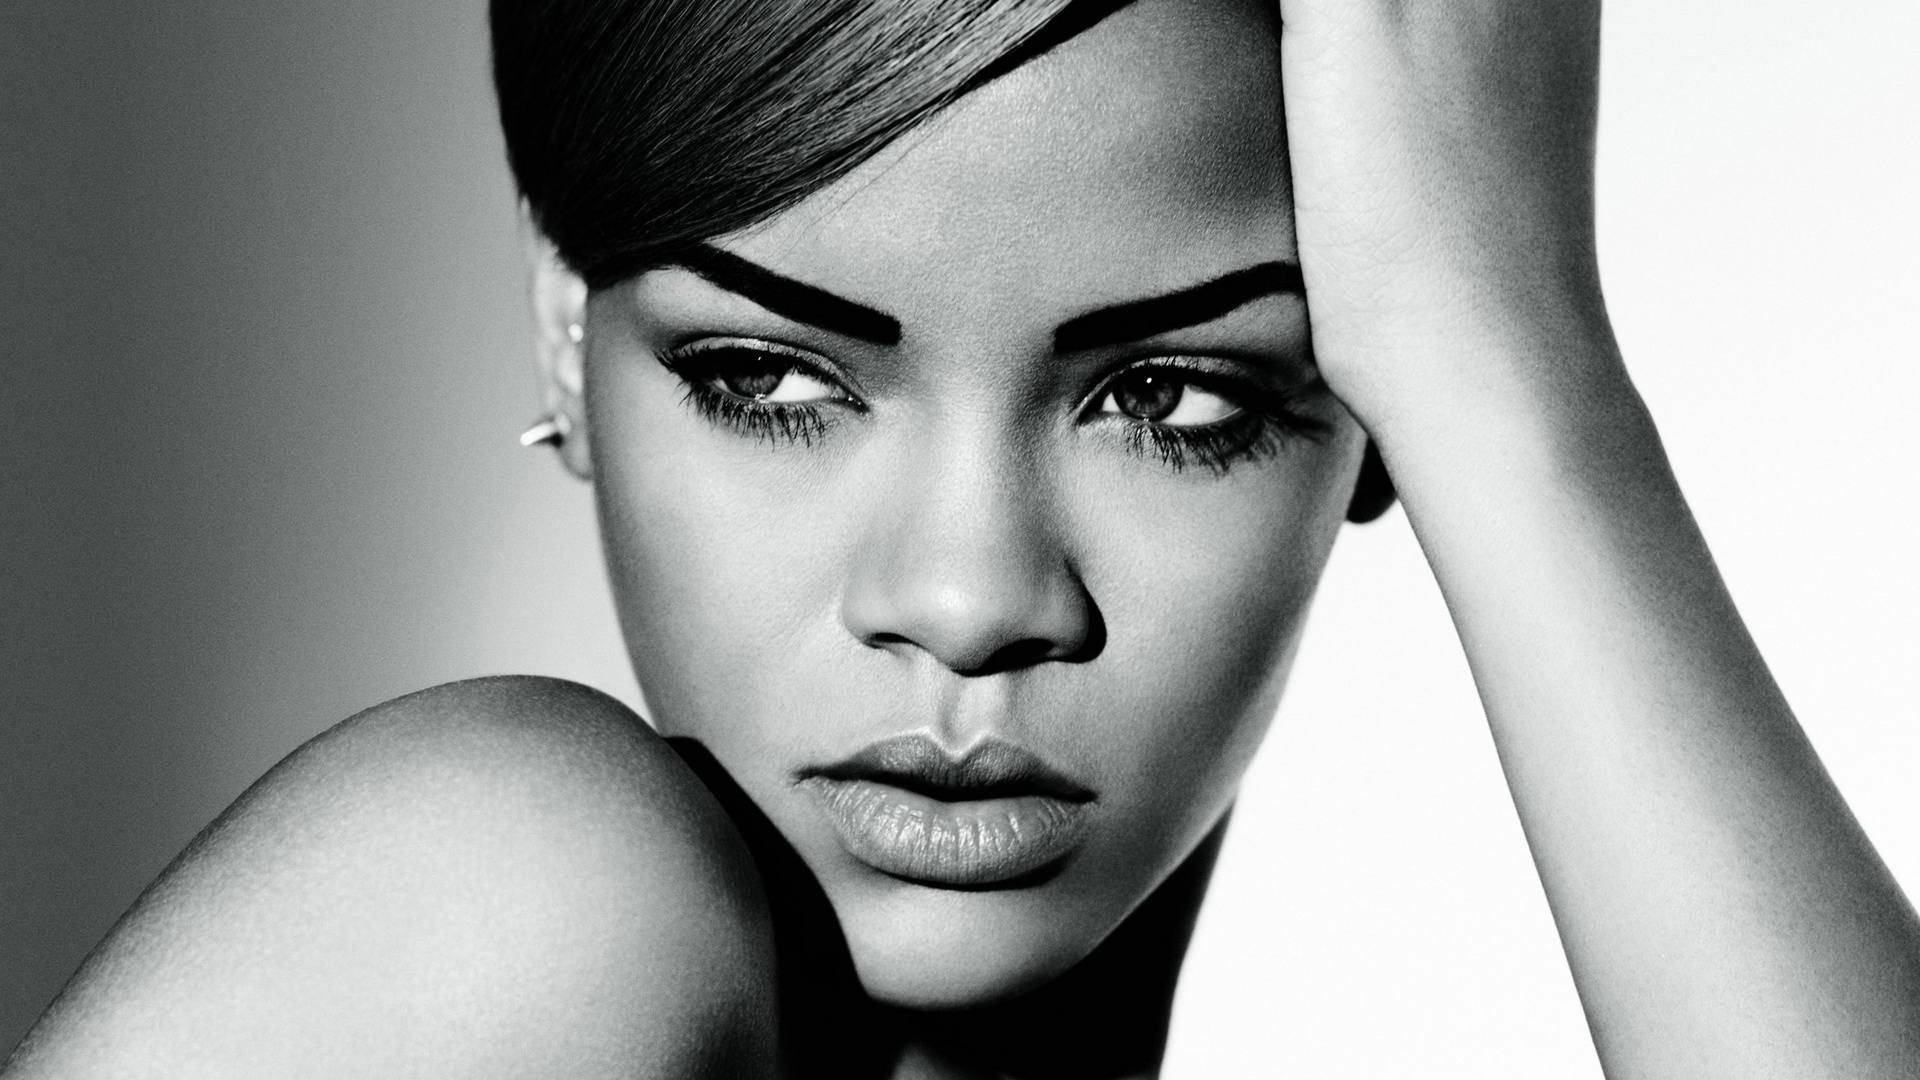 Rihanna full hd wallpaper and background image 1920x1080 id321566 music rihanna wallpaper voltagebd Images